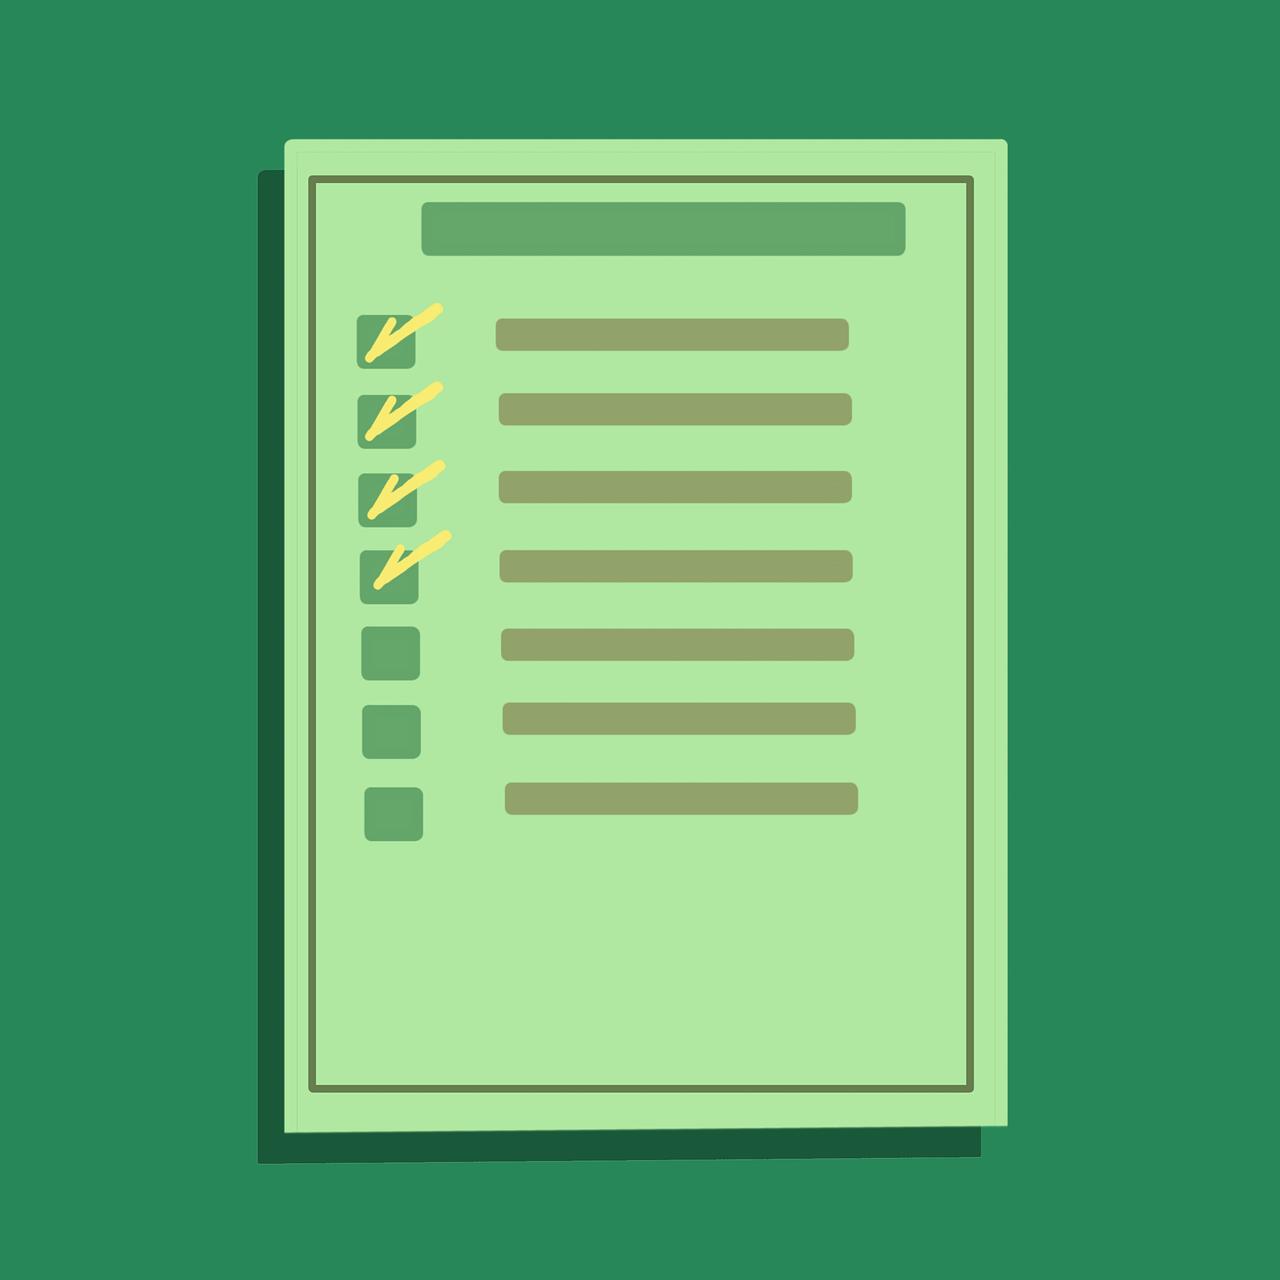 blog ideas list